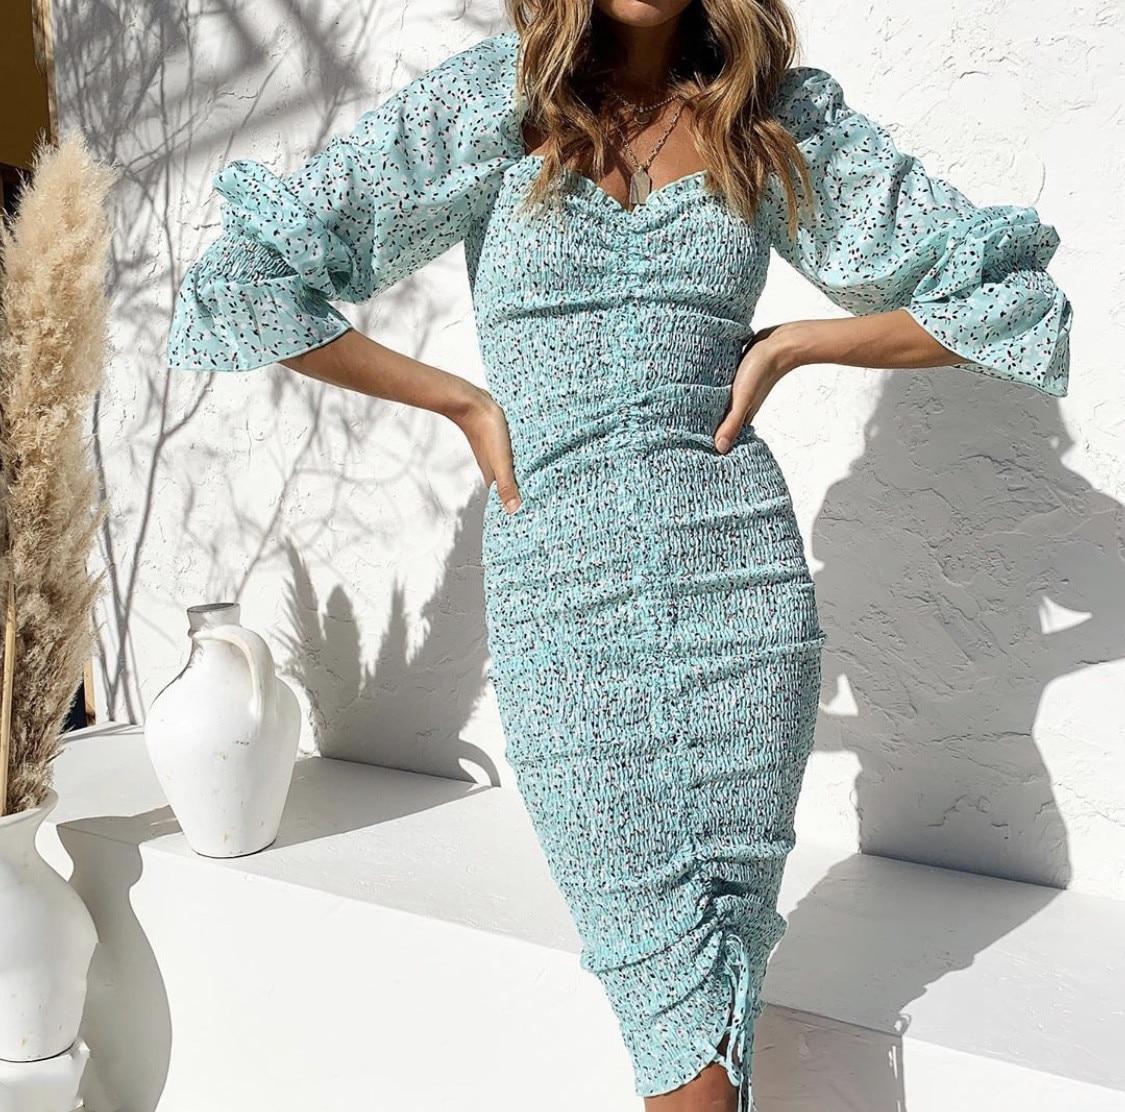 2020 Trendy Square Neck Floral Print Dress Women Long Sleeve Bodycon Mini Dress Boho Beach Dress for Girls Party Clothing 10